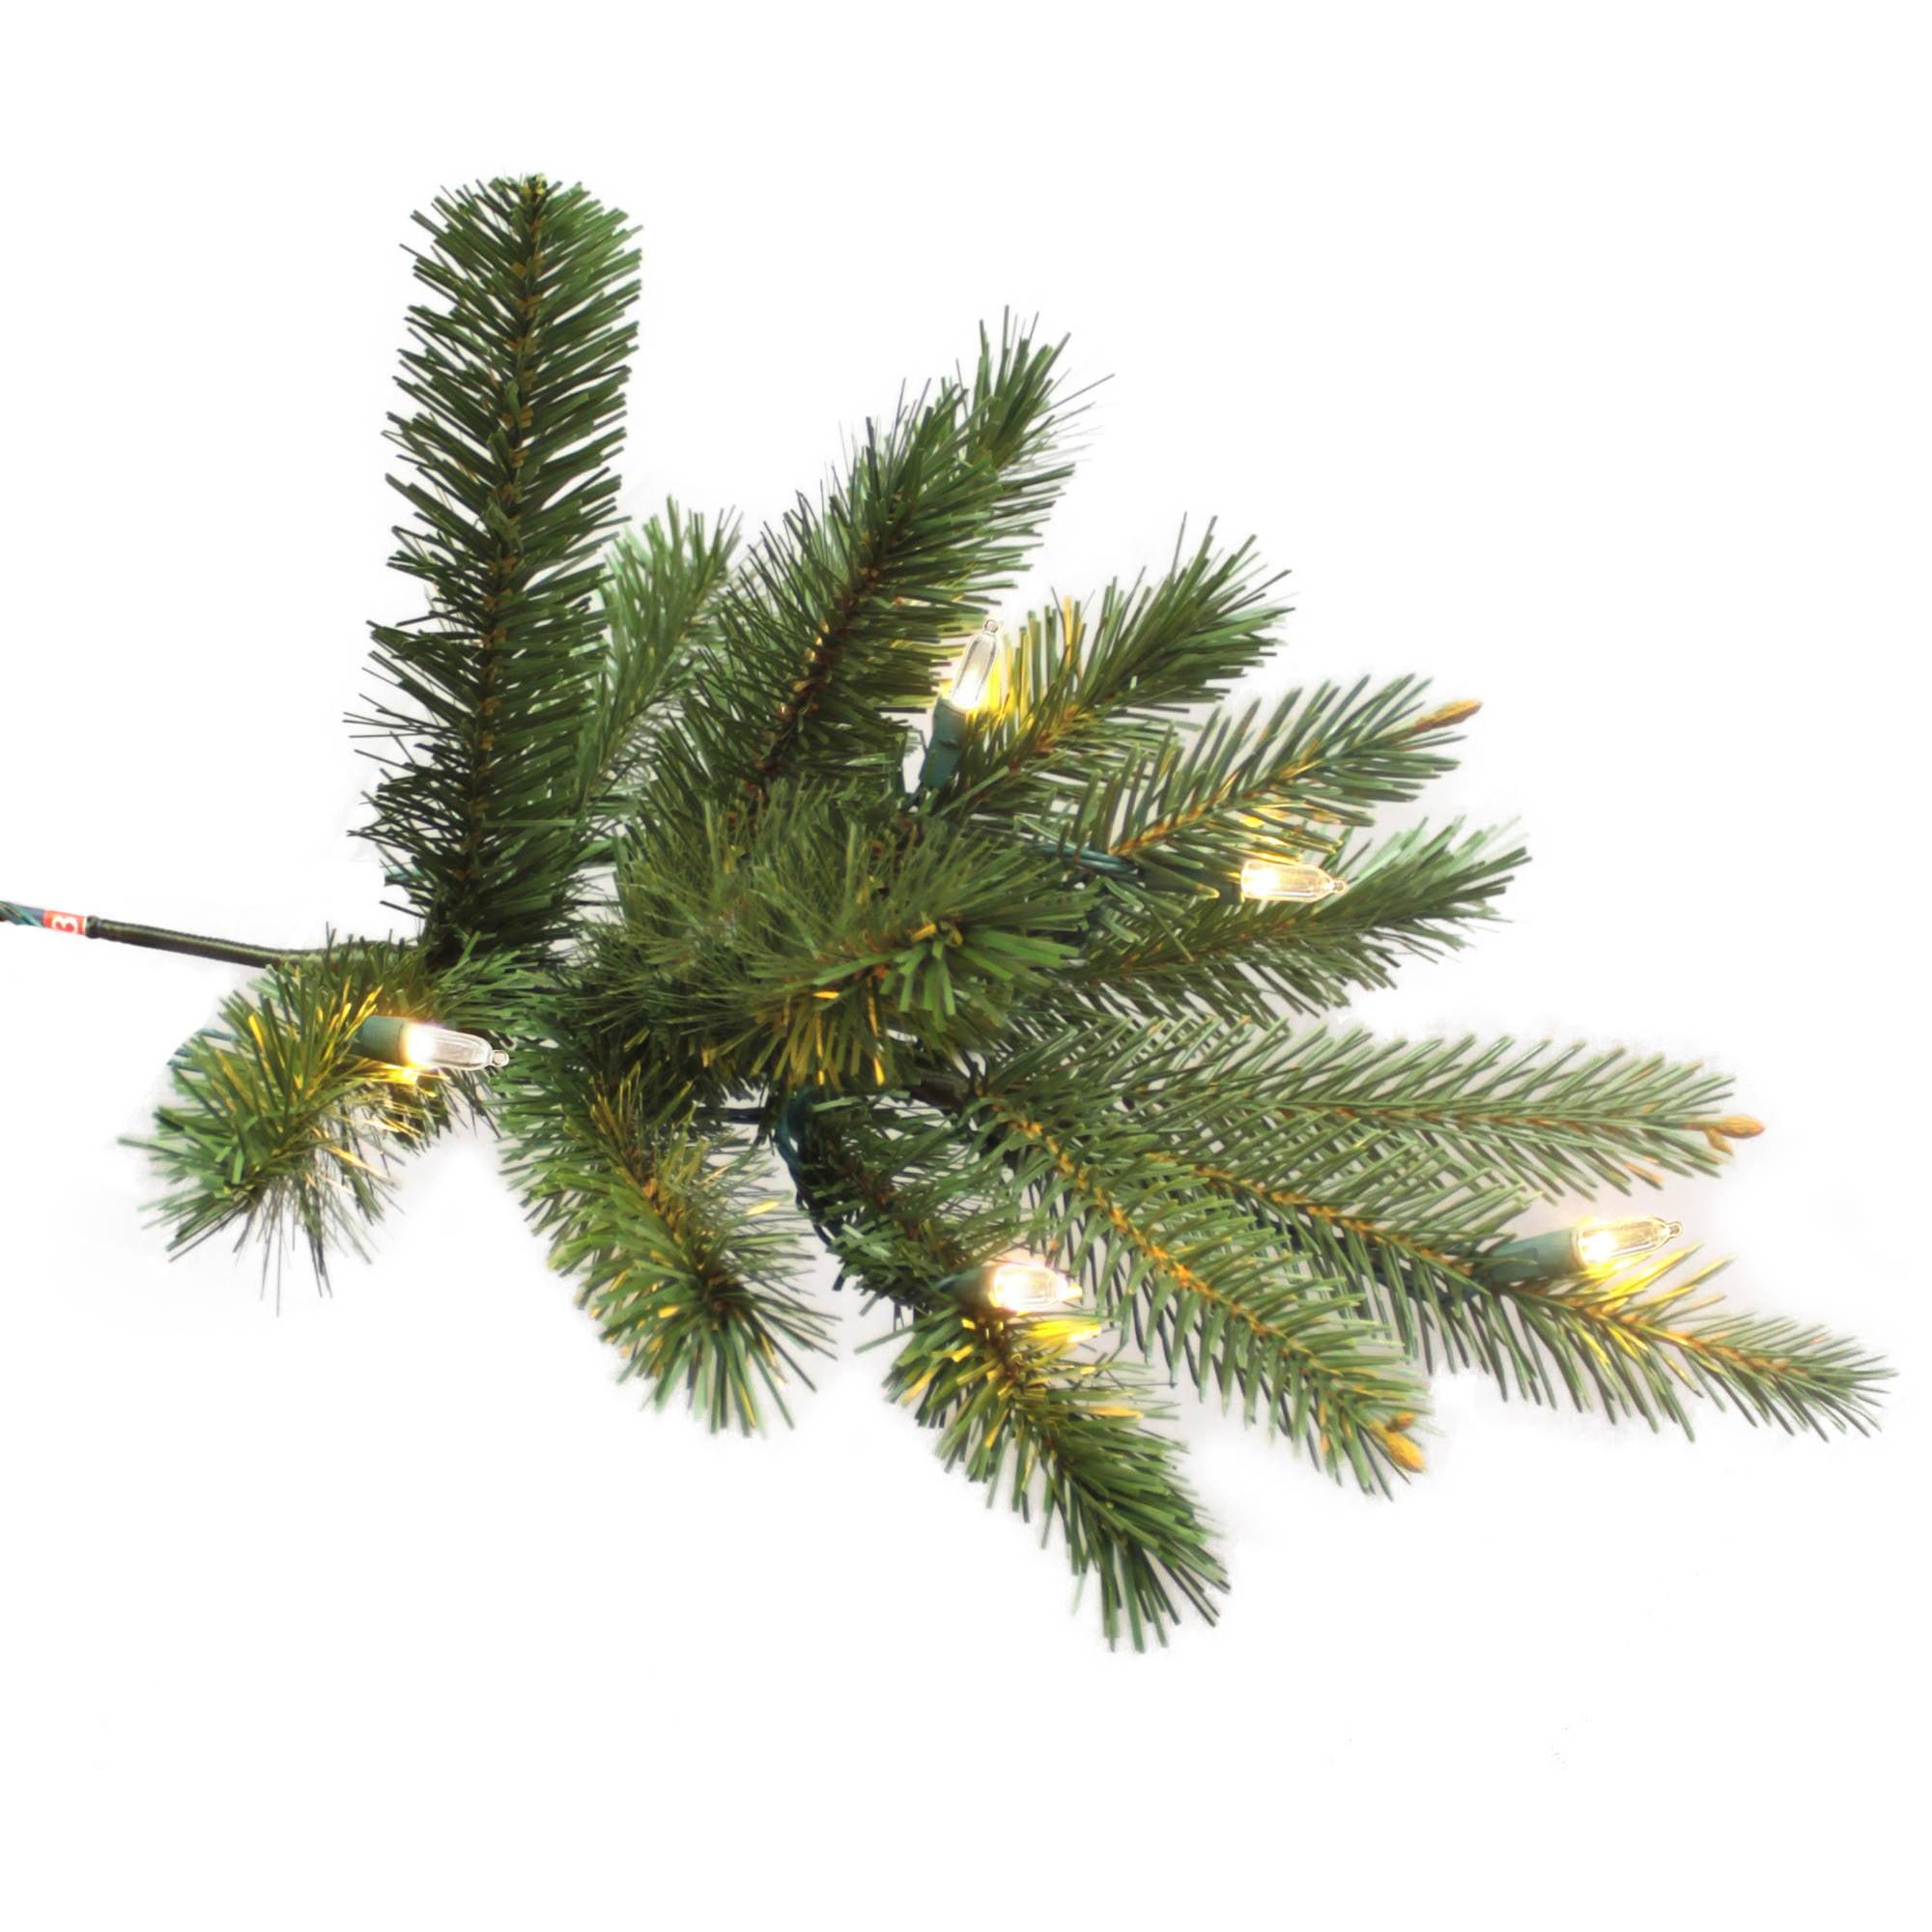 GE Pre-Lit 7.5\' Douglas Fir Artificial Christmas Tree, Dual Color ...